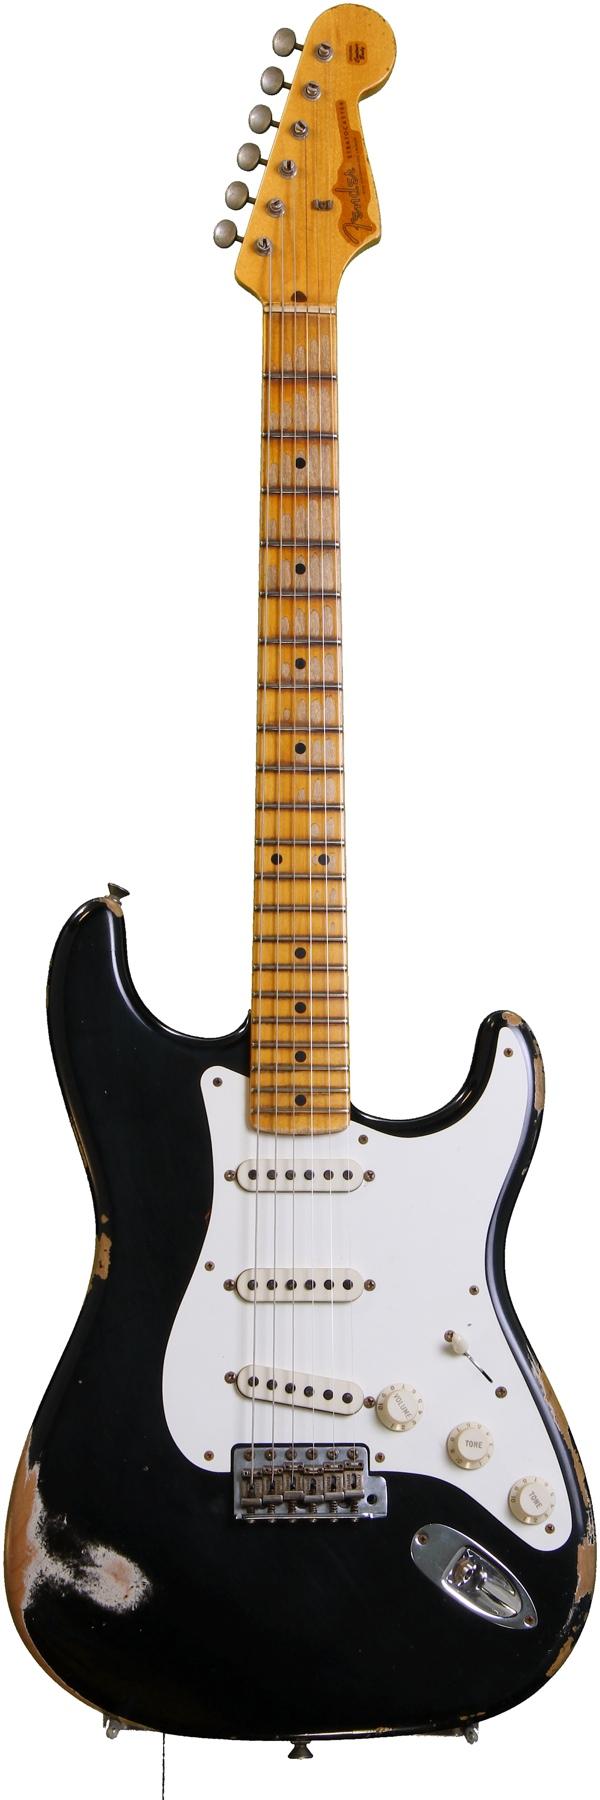 Fender Custom Shop 1956 Heavy Relic Strat - Black Ice | Sweetwater.com